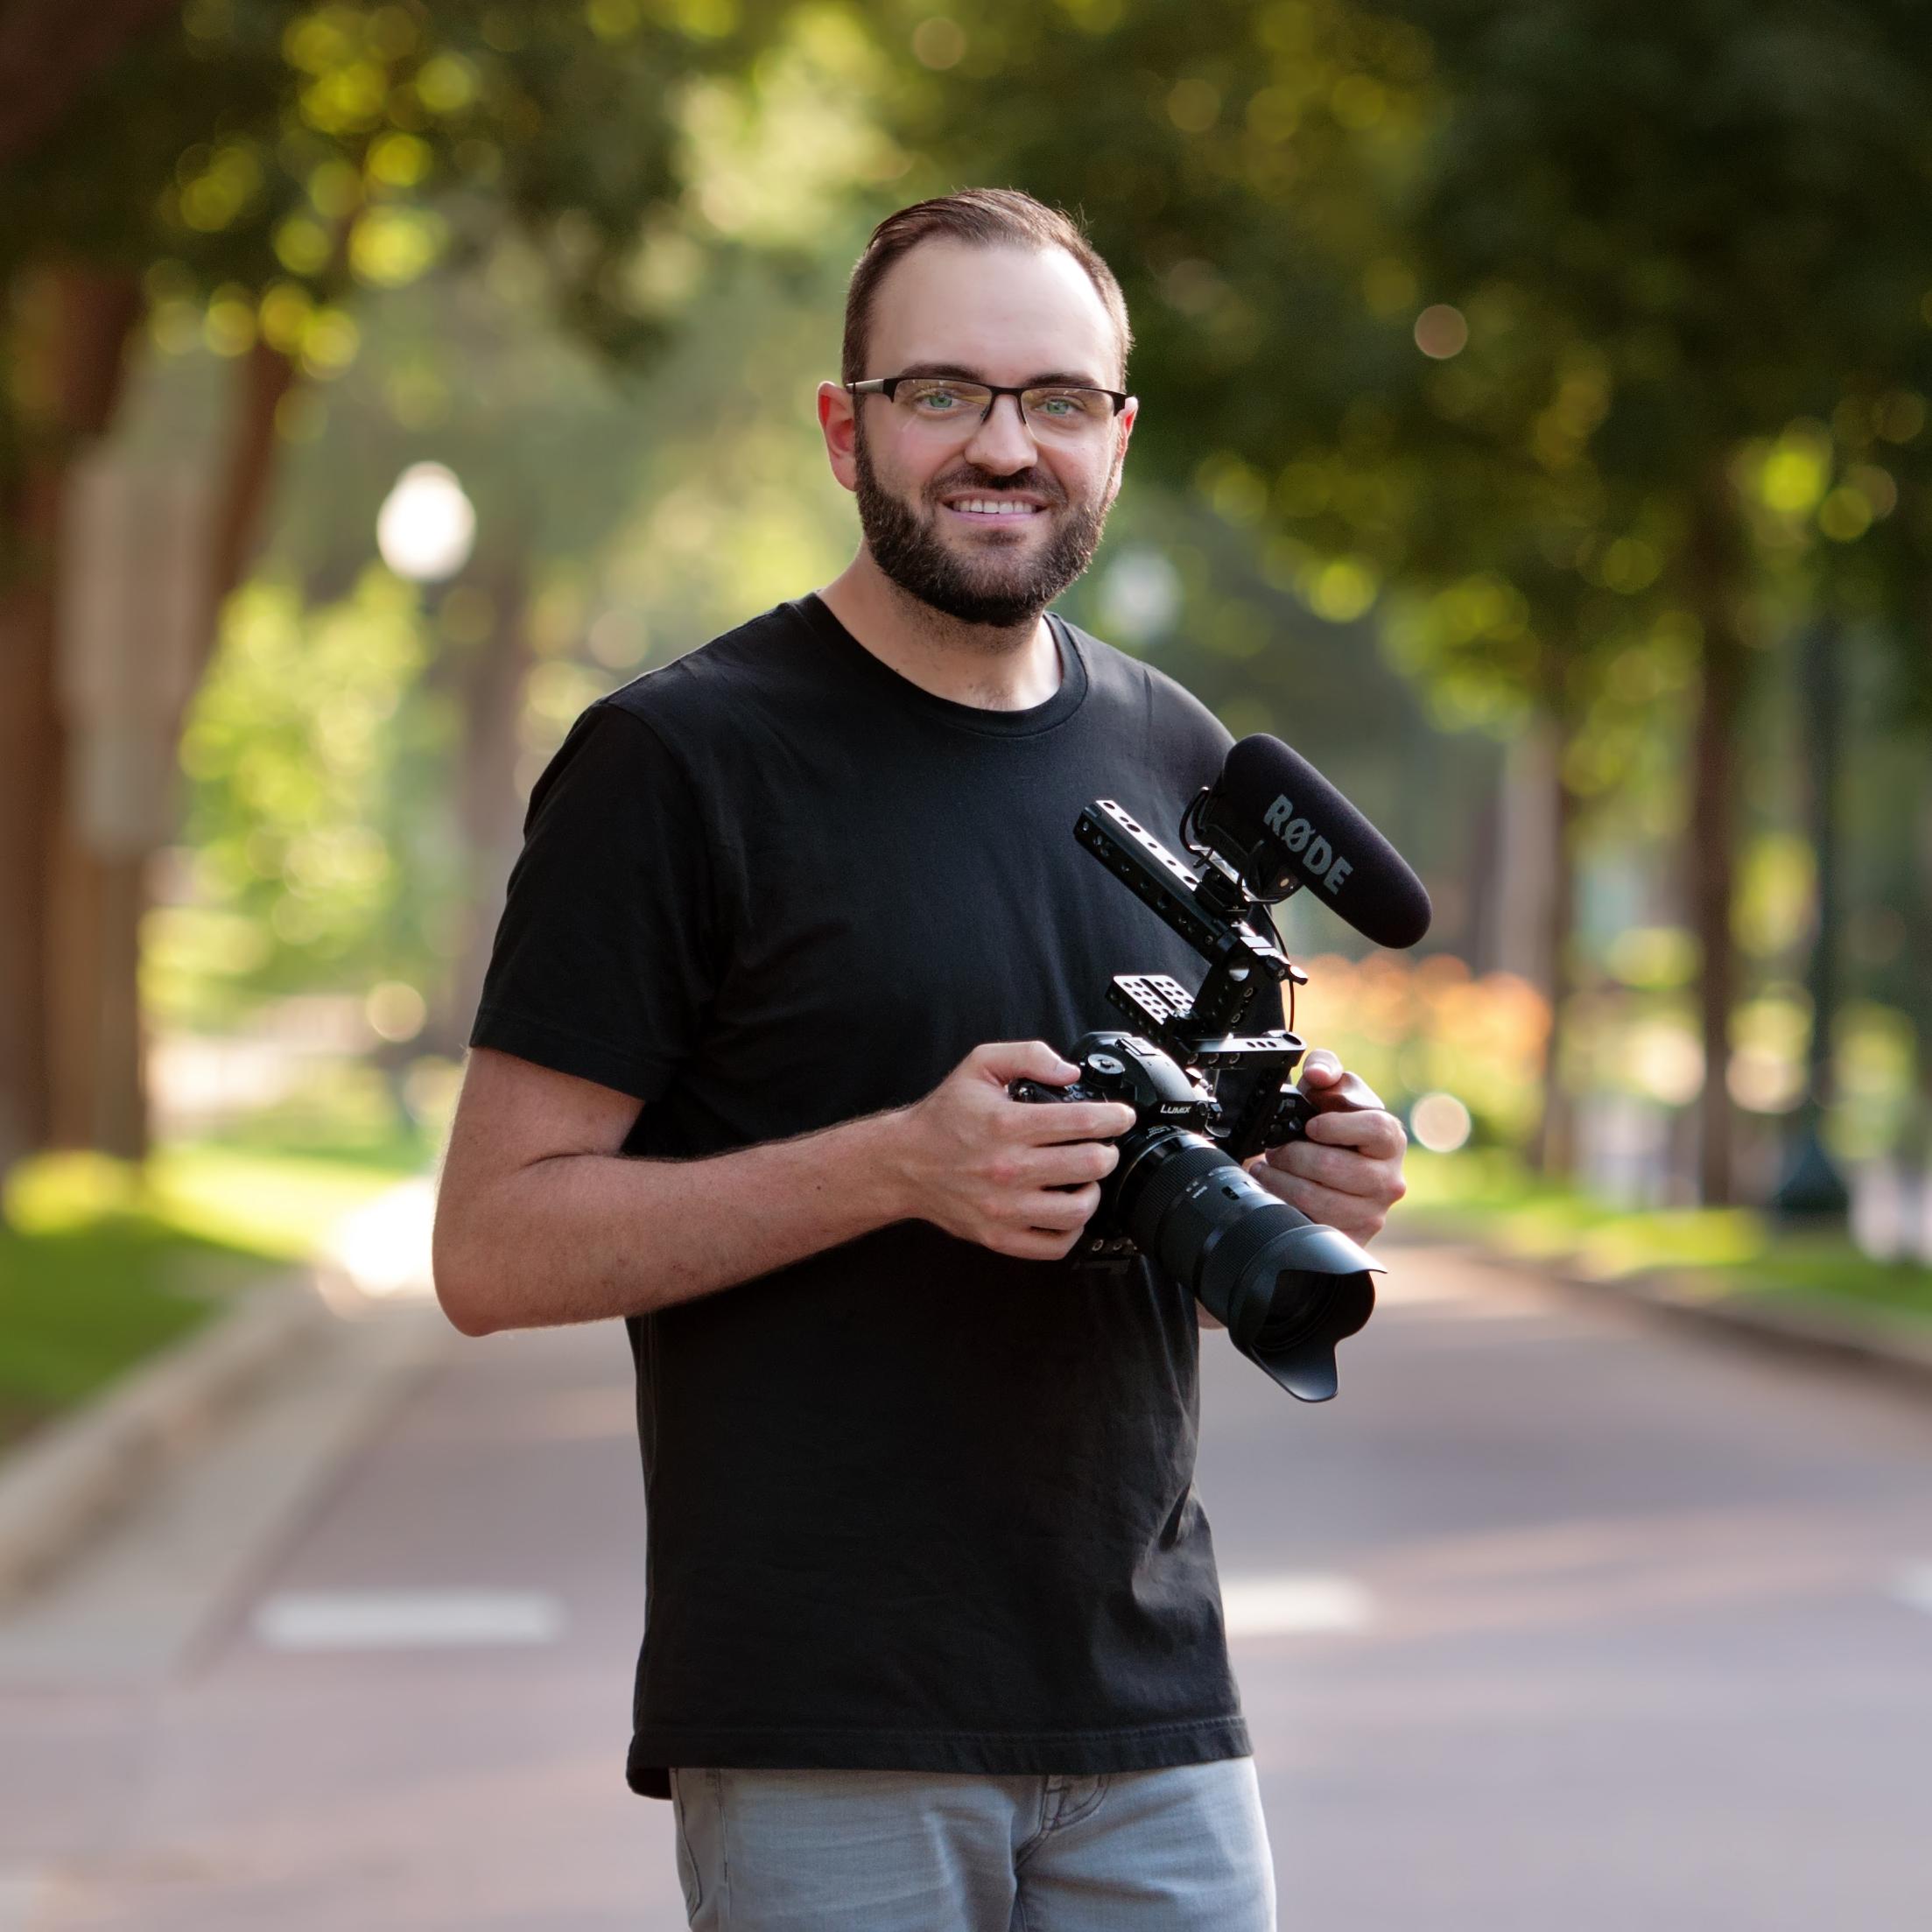 Craig Weflen - Owner + Filmmaker